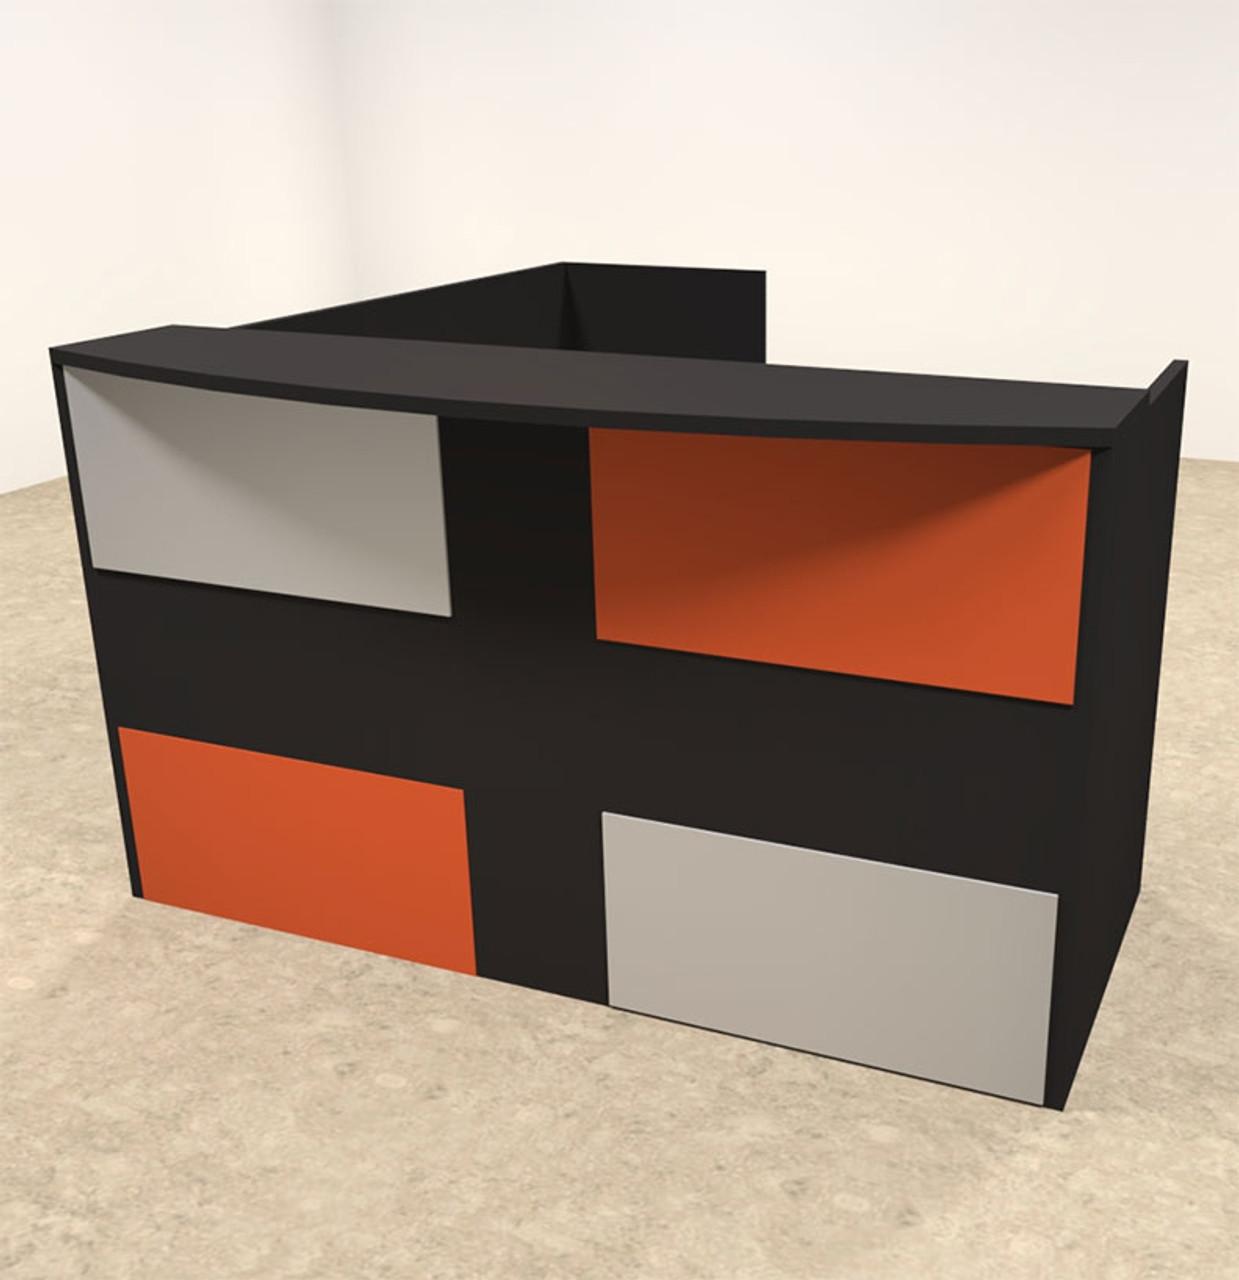 3pc L Shaped Modern Acrylic Panel Office Reception Desk, #OT-SUL-RM48